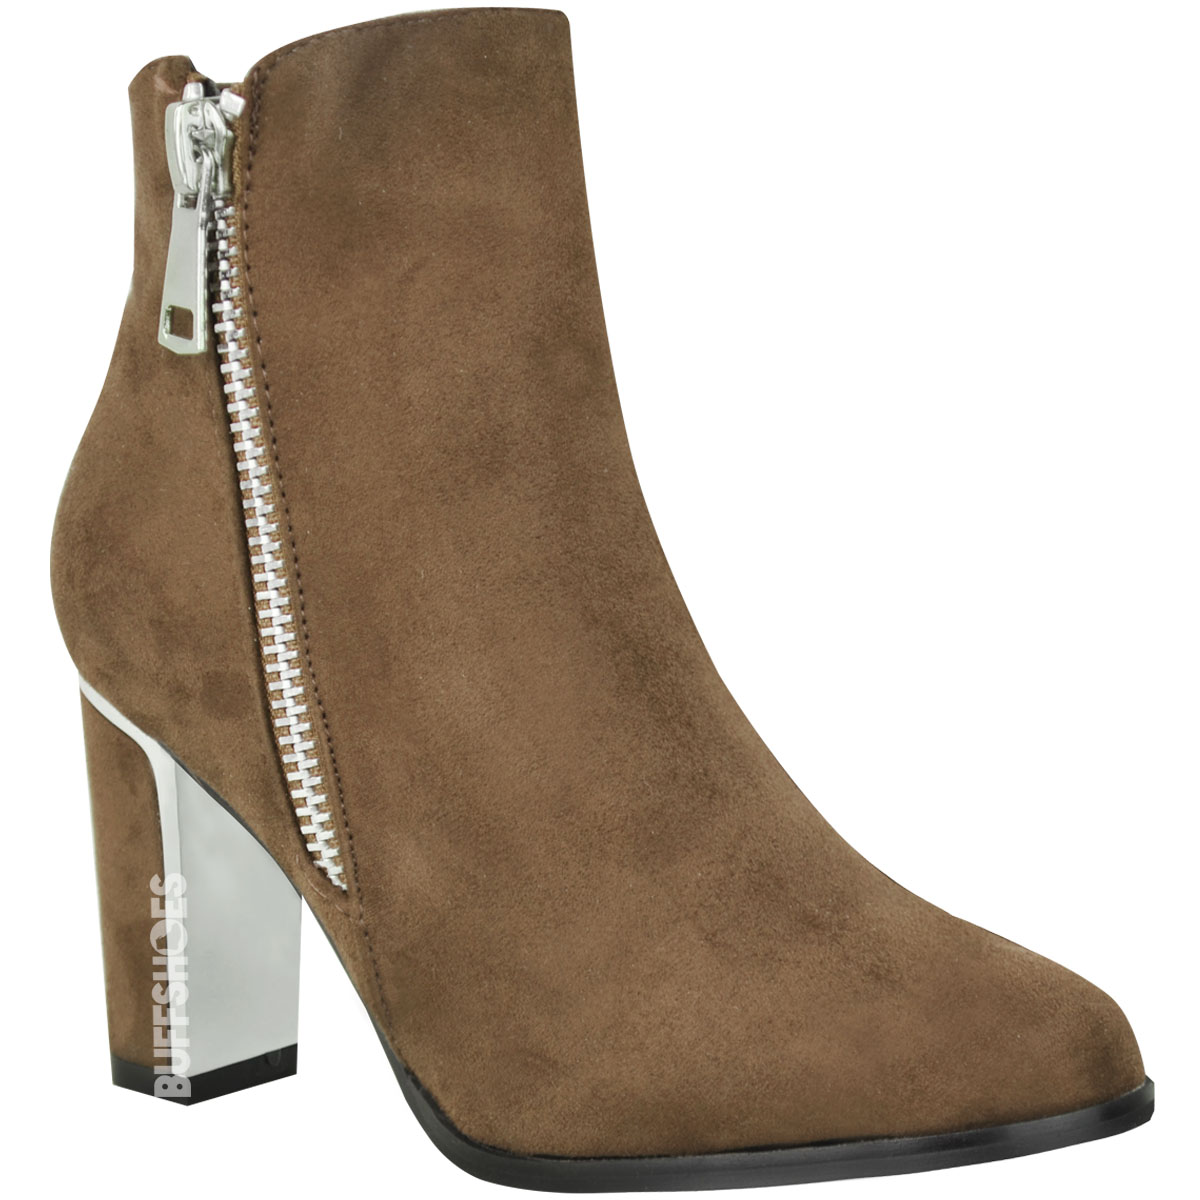 womens mid high low heel block platform ankle